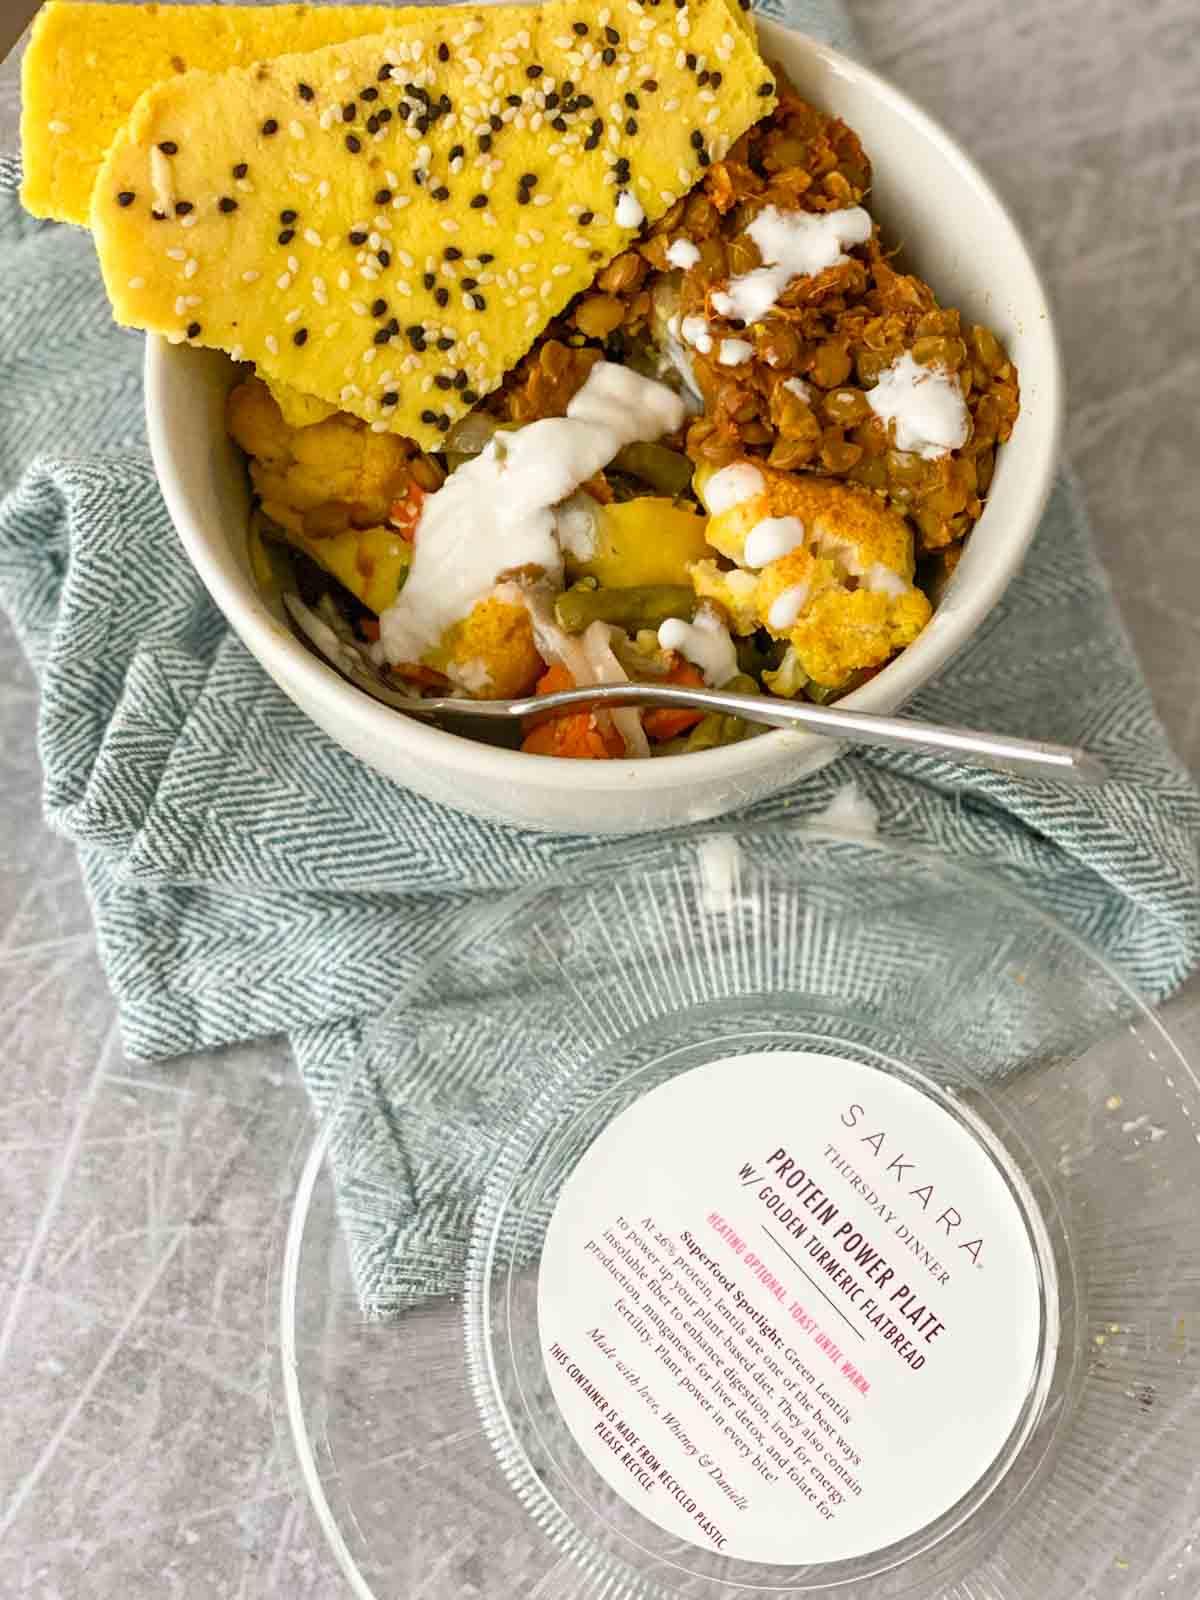 Sakara protein power plat in bowl, turmeric flatbread on side